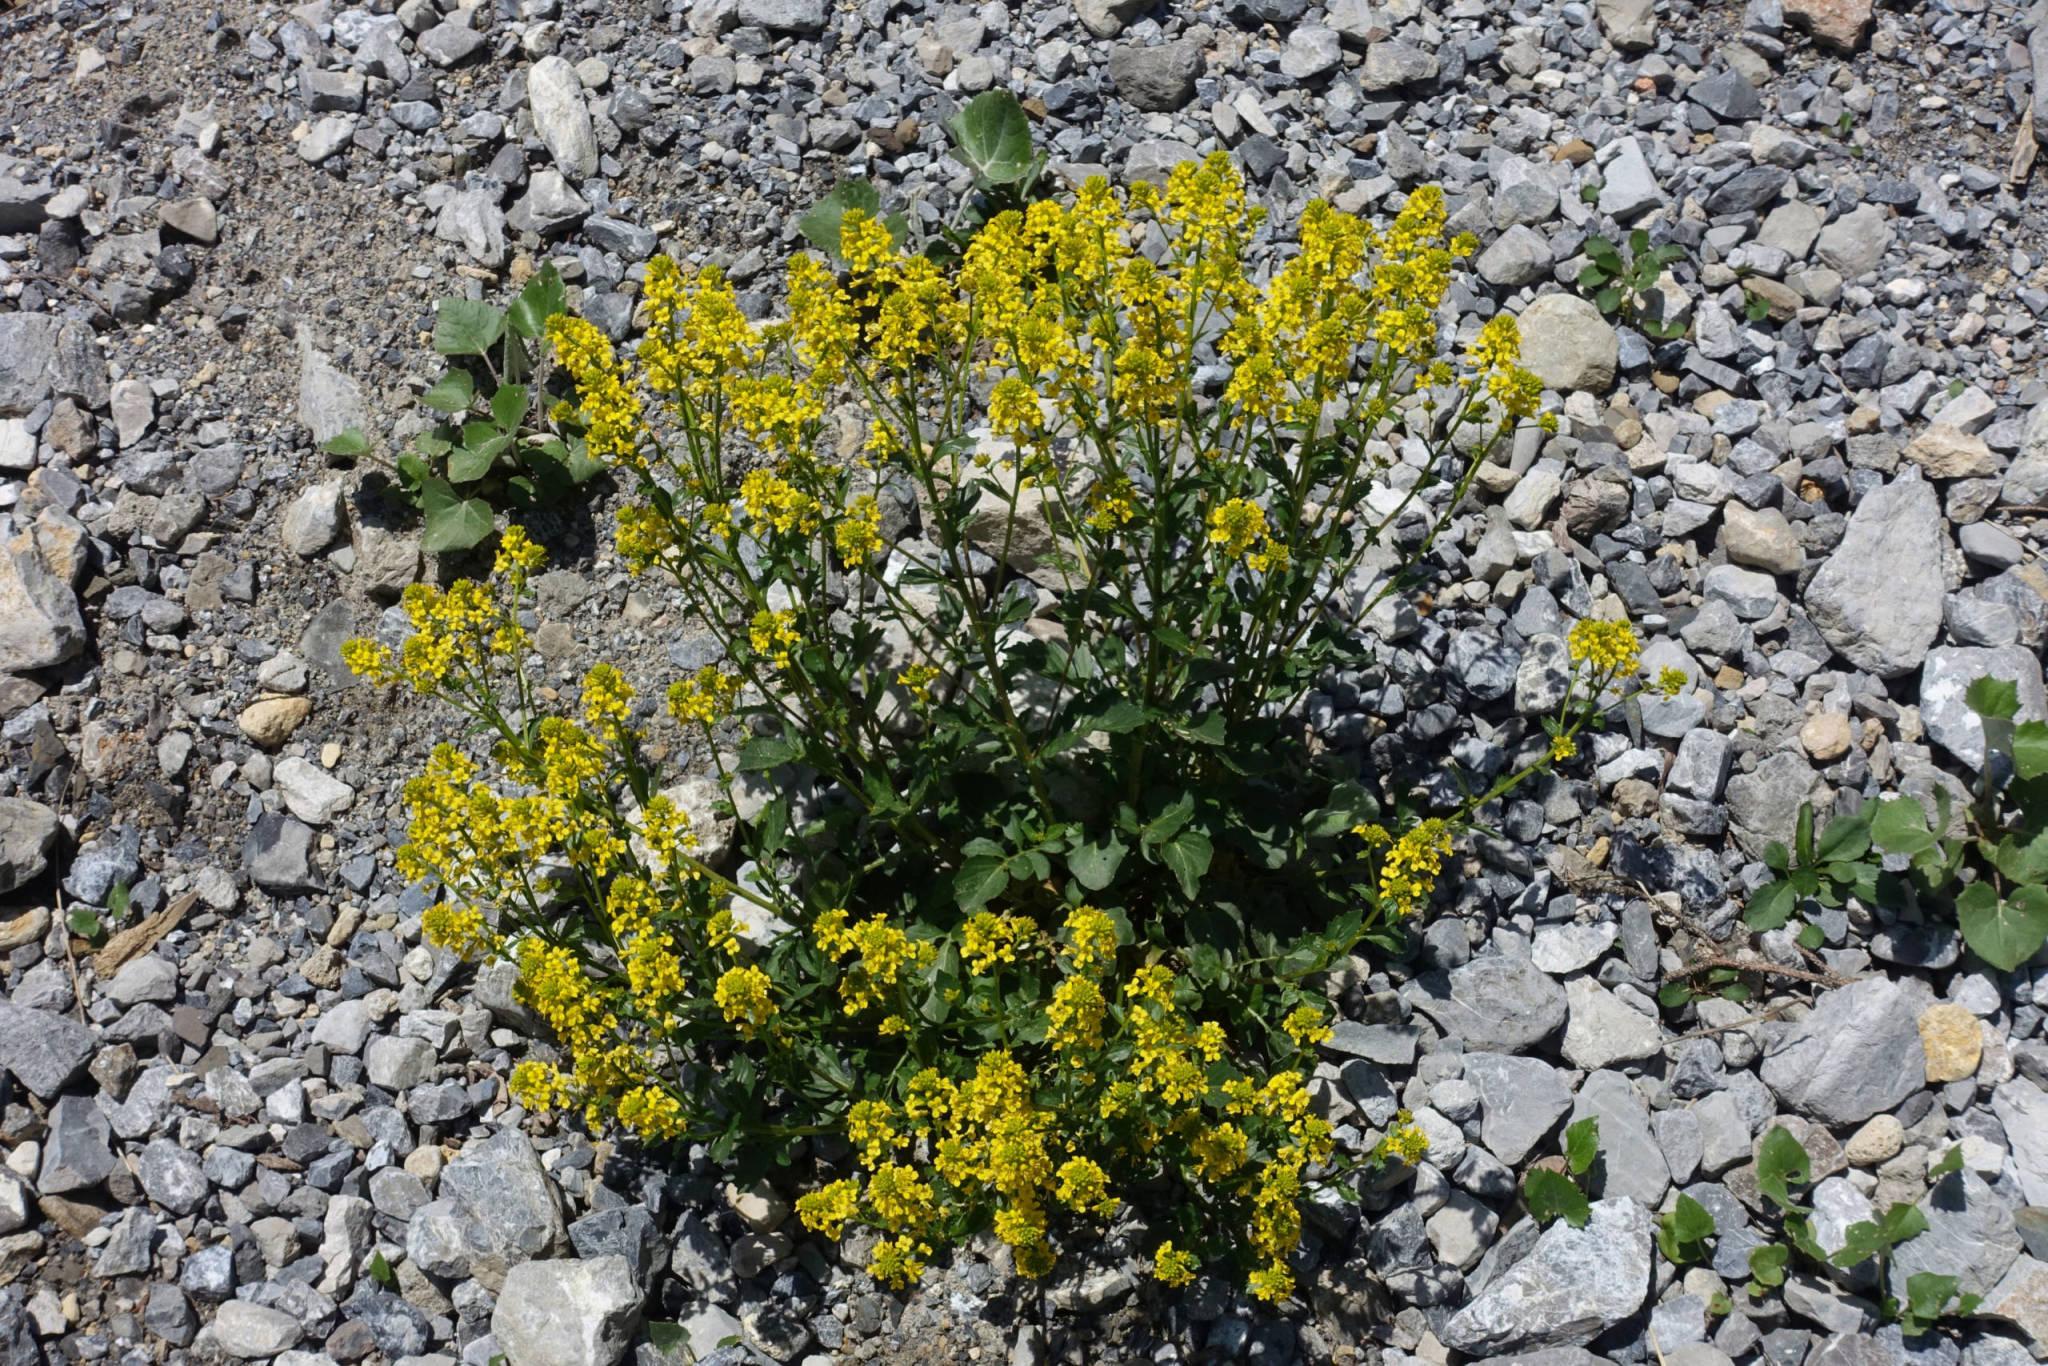 Viele Alpenblumen stehen bereits in voller Blüte (Foto: Peter Backé)